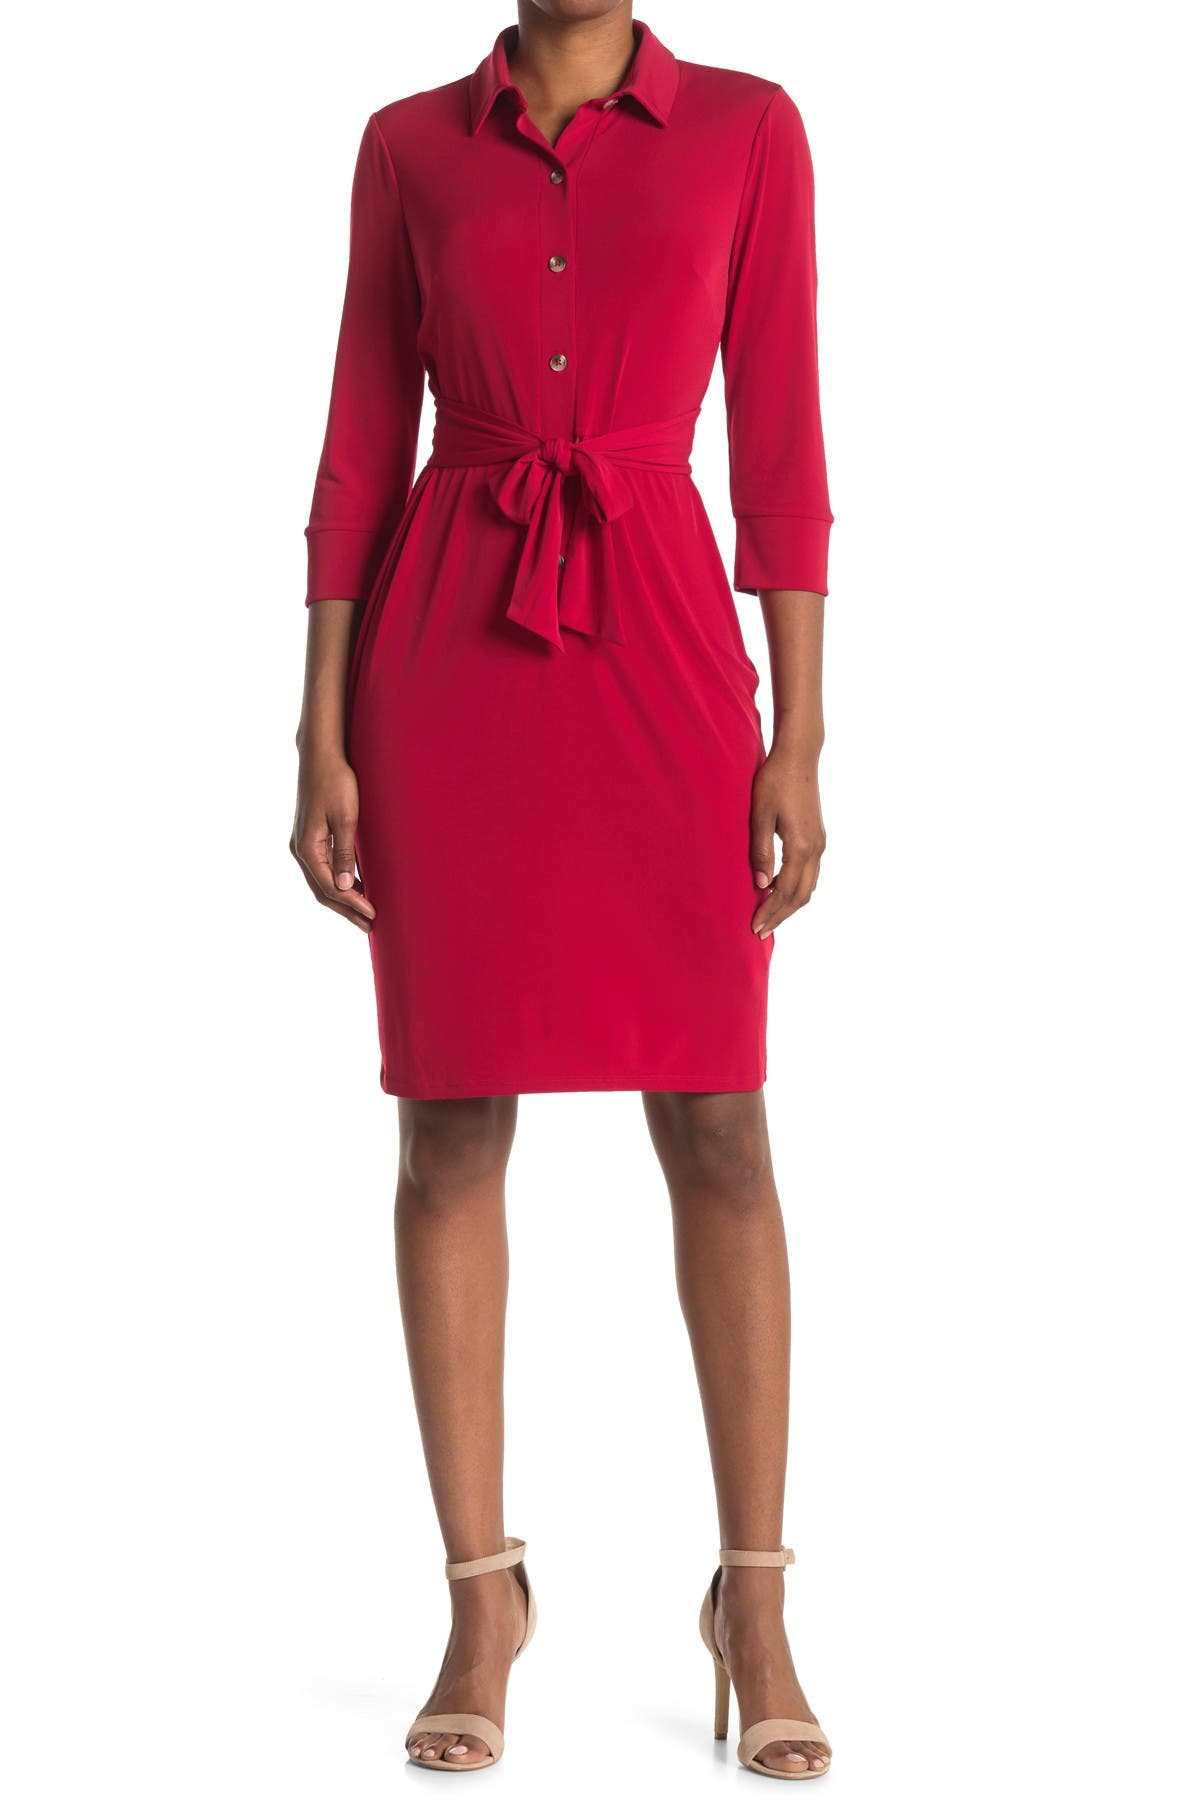 Image of Maggy London Tie Waist Shirt Dress